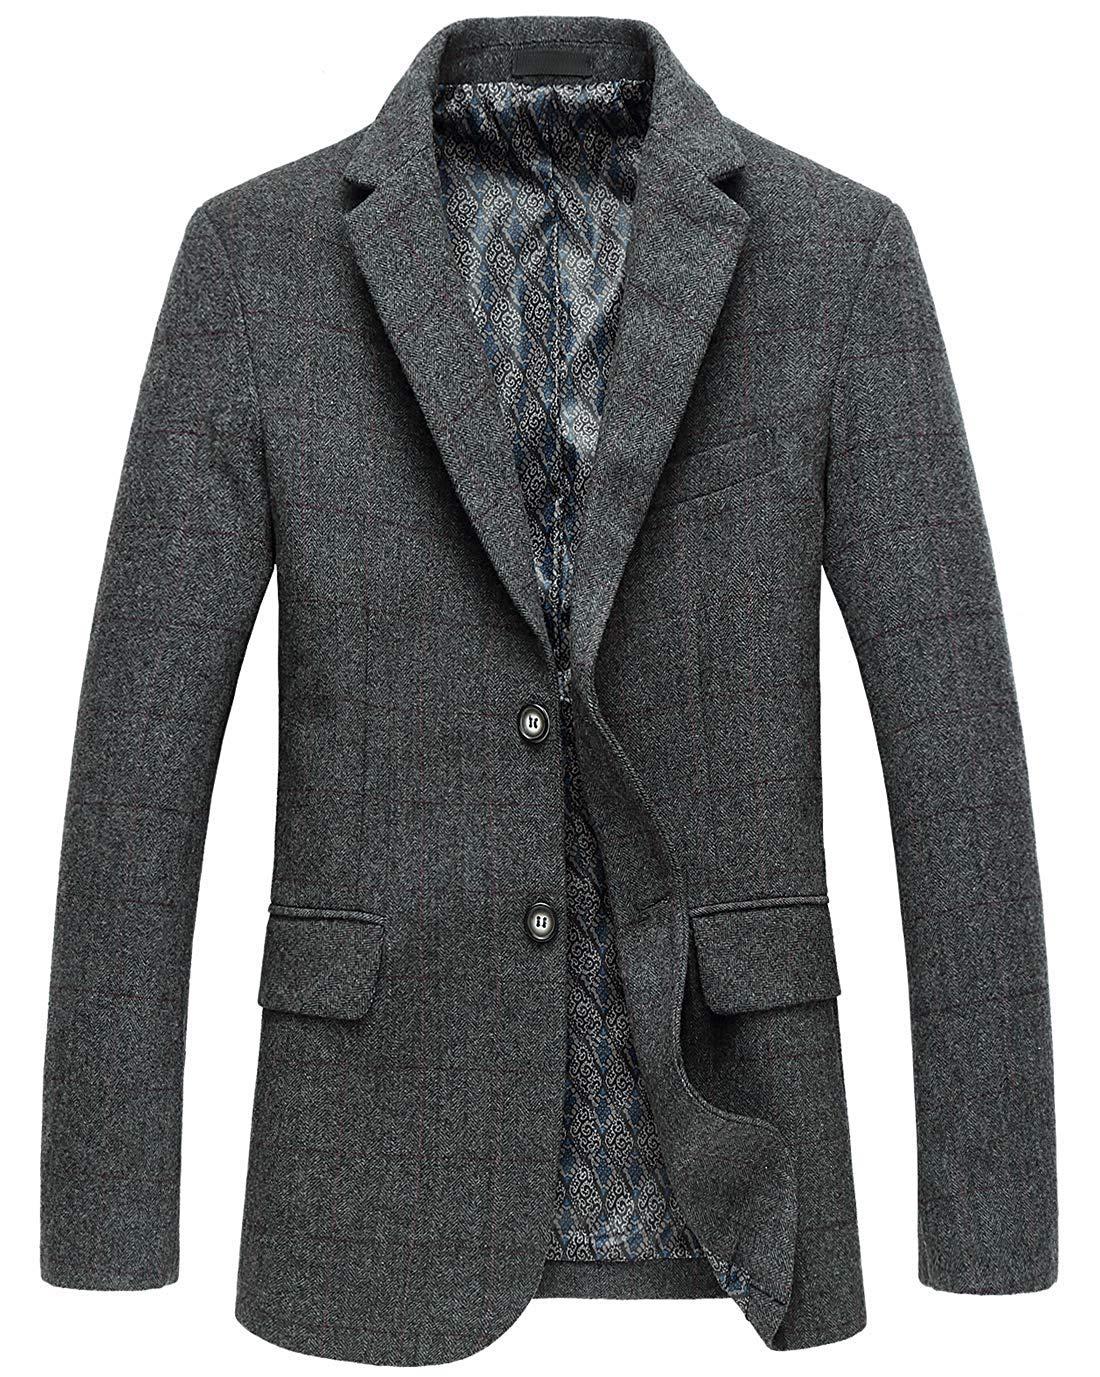 chouyatou Men's Classic Plaid Two-Button Wool Blend Tailored Suit Separate Coat (Medium, Gray) by chouyatou